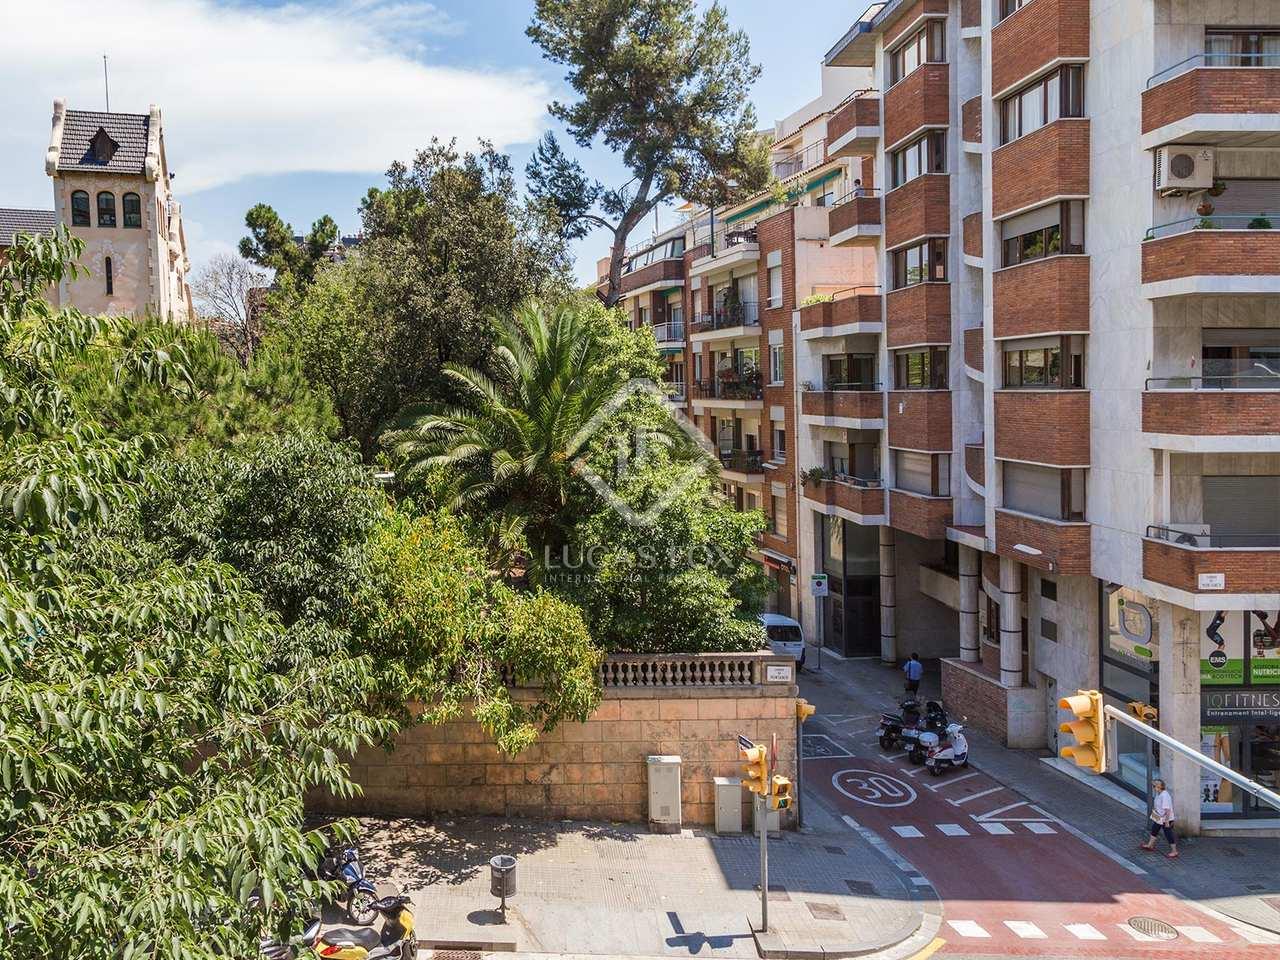 Apartment for rent in galvany barcelona 39 s zona alta - Zona alta barcelona ...